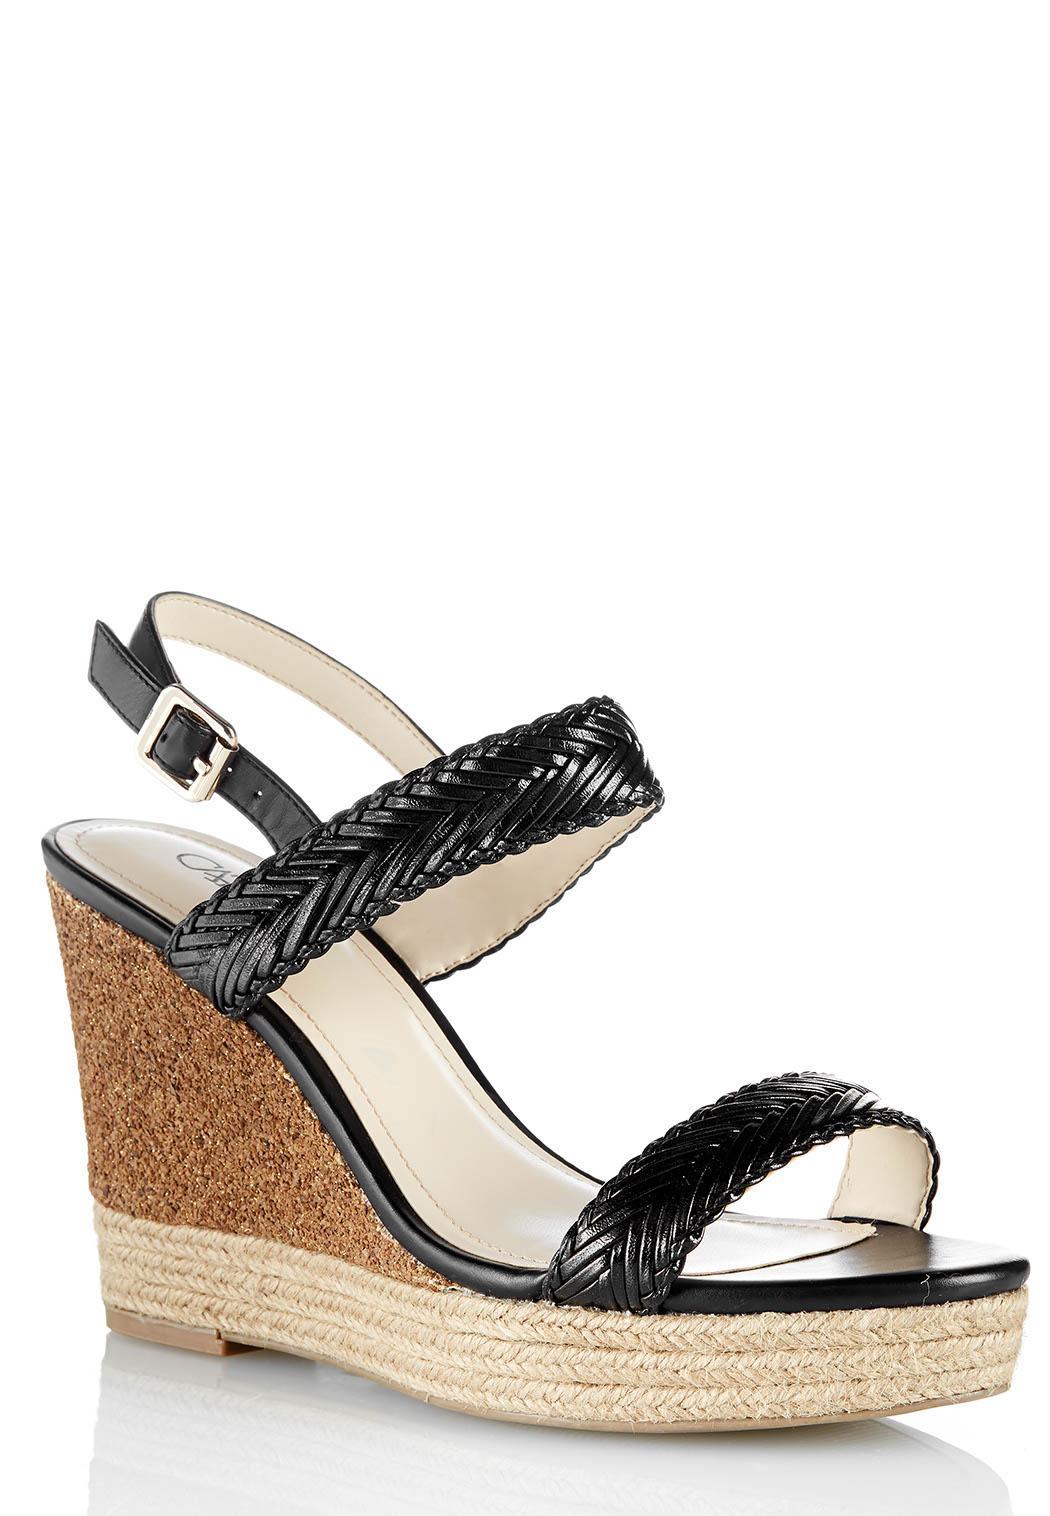 Home D Shoes D Wedges D Woven Glitter Platform Wedges (Style